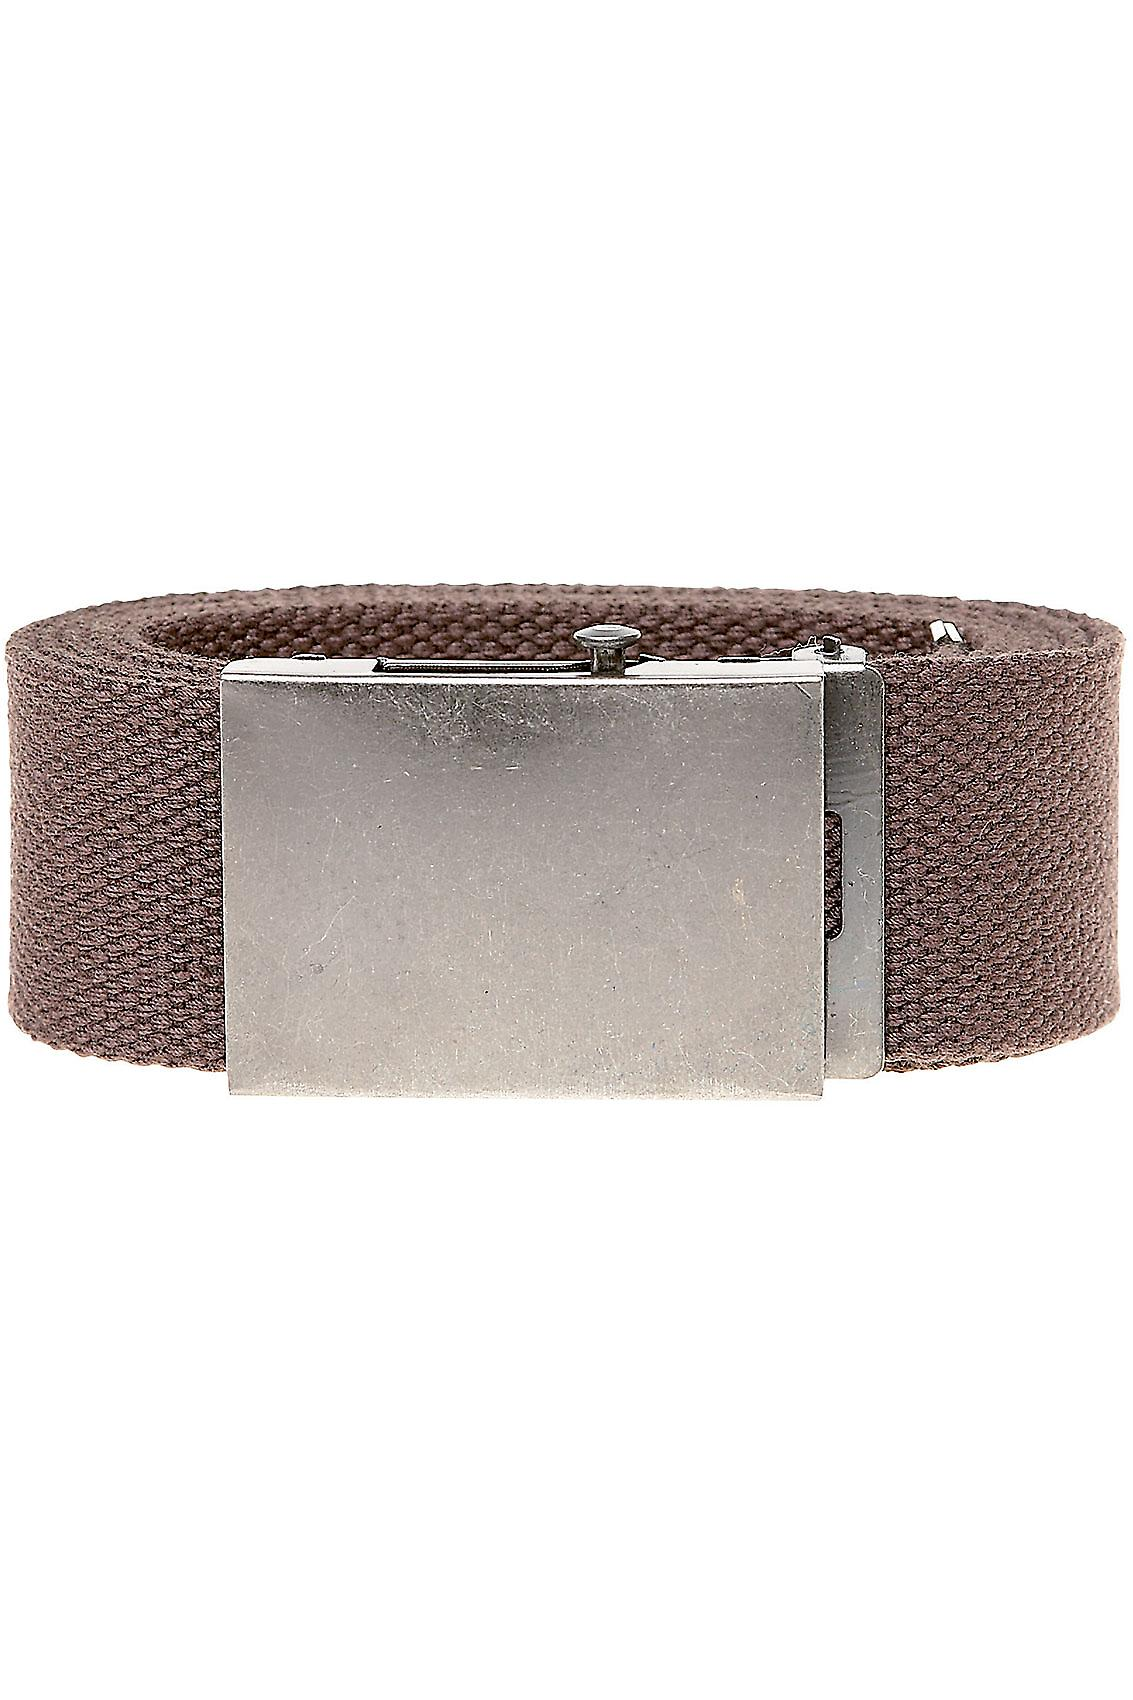 D555 King Size Brown Webbing Belt